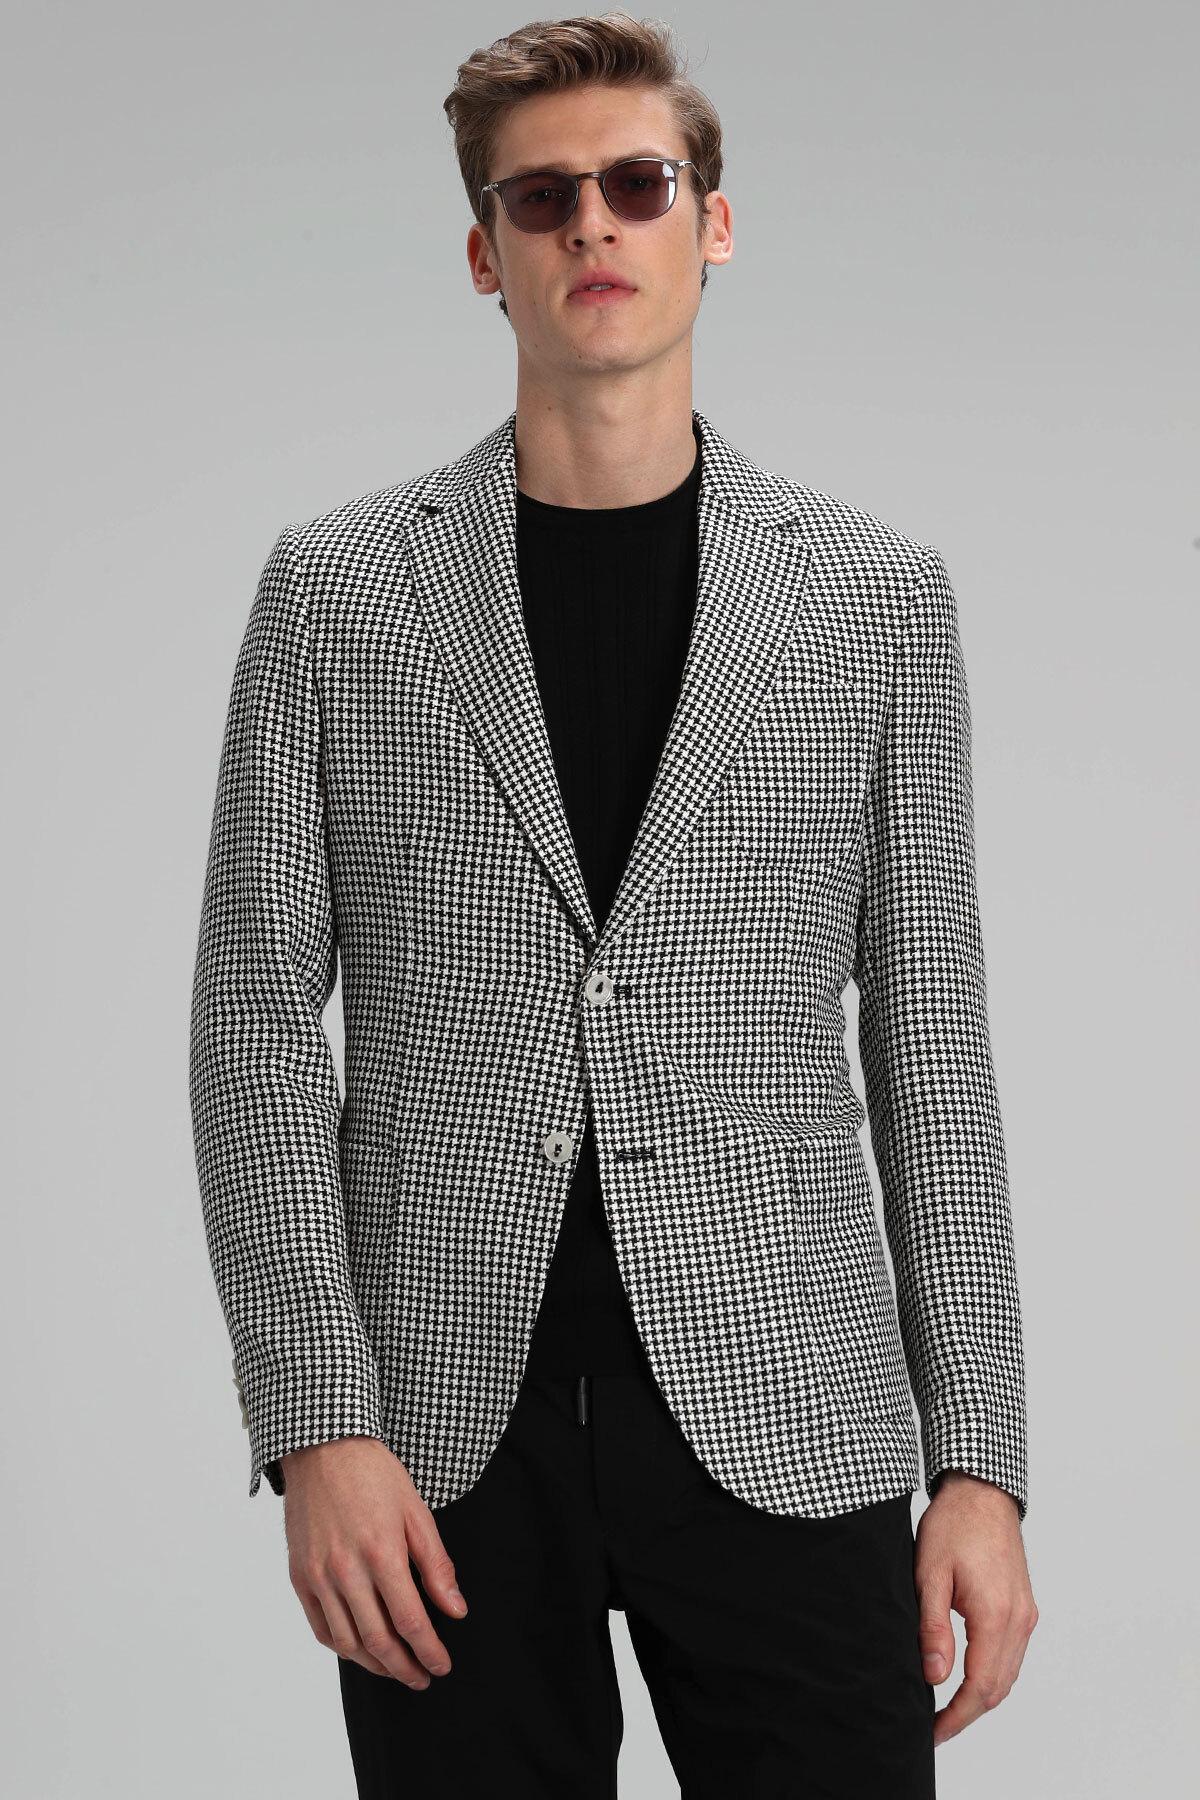 Monar Spor Blazer Ceket Slim Fit Siyah